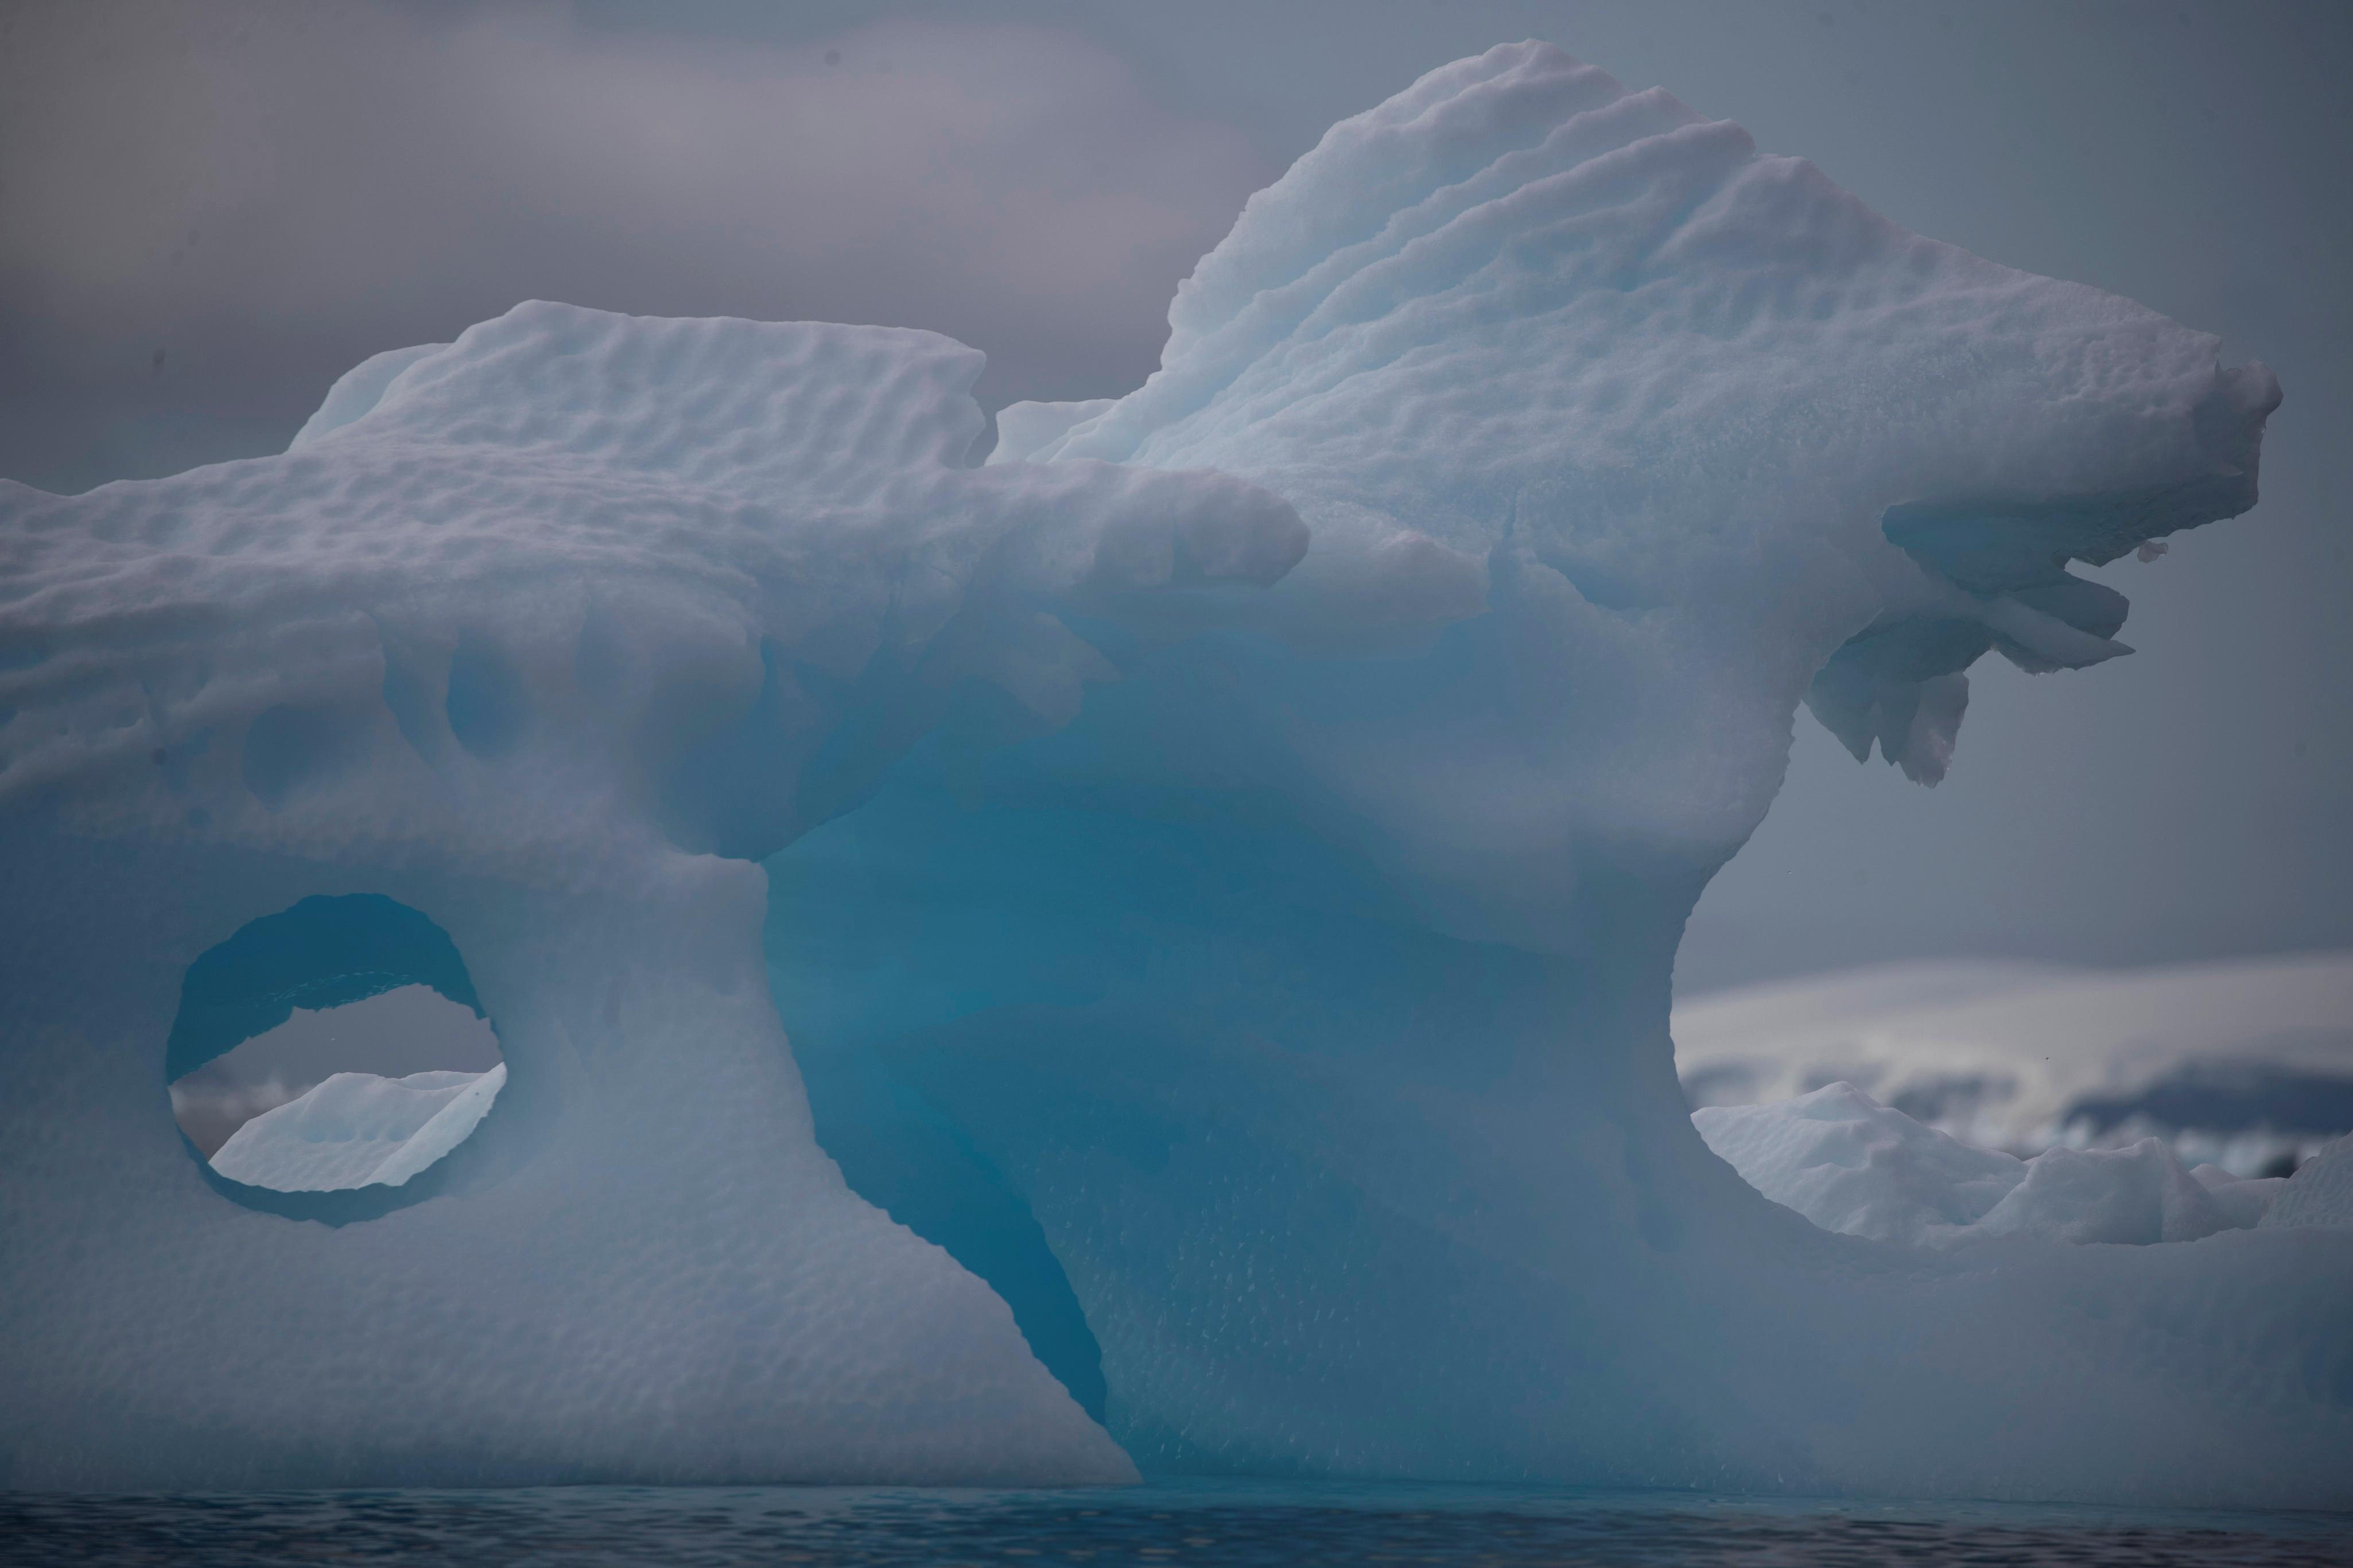 An iceberg floats near Fournier Bay, Antarctica, February February 3, 2020. Picture taken February 3, 2020. REUTERS/Ueslei Marcelino - RC25ZE9G6RR3